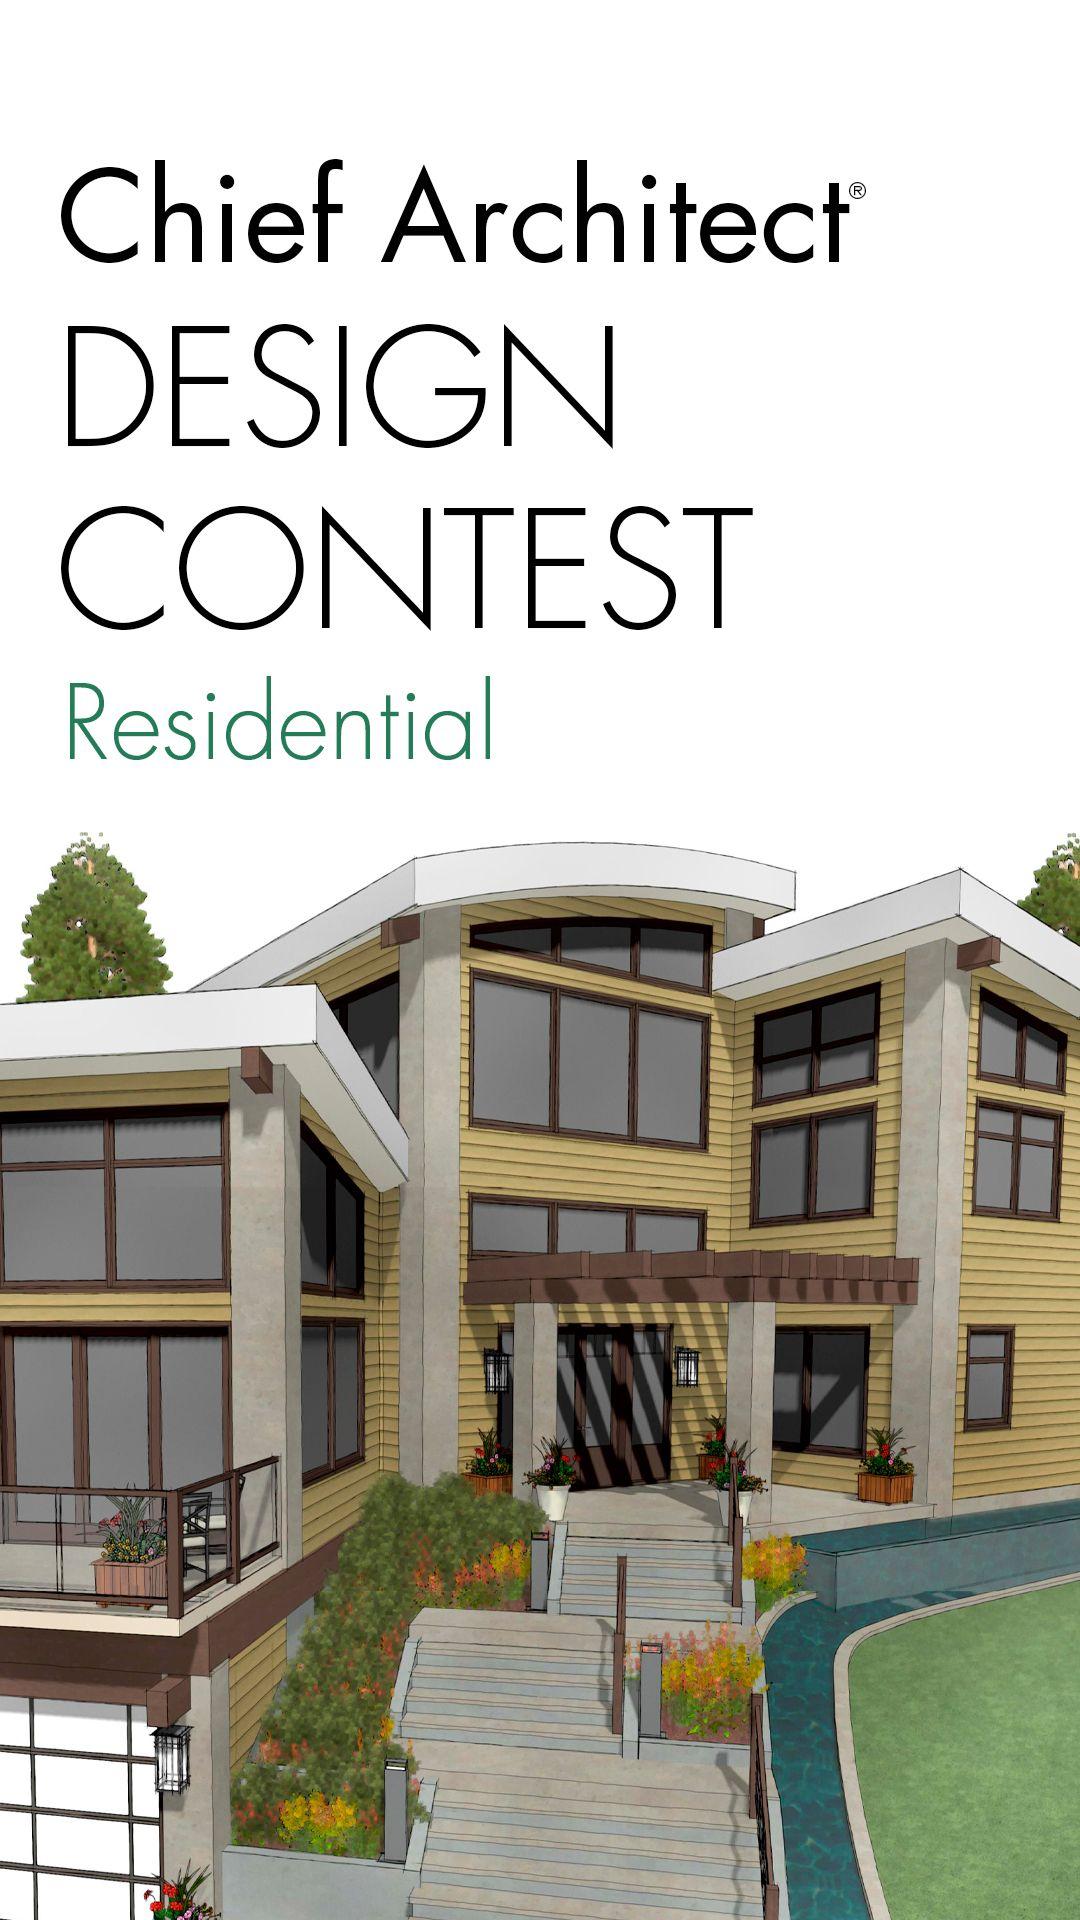 Design Contest Contest Design Chief Architect Architect Design